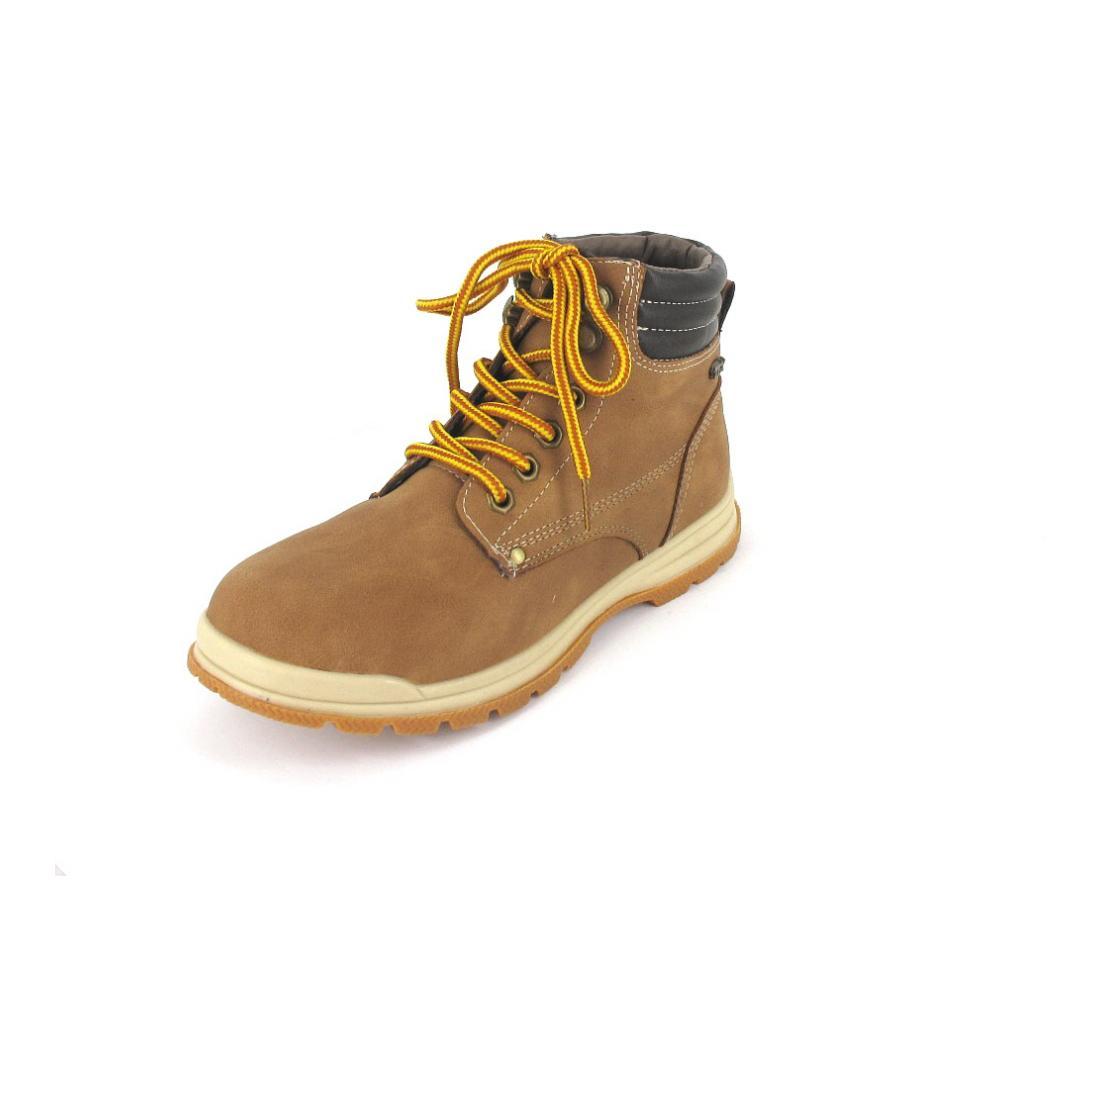 Indigo Boots